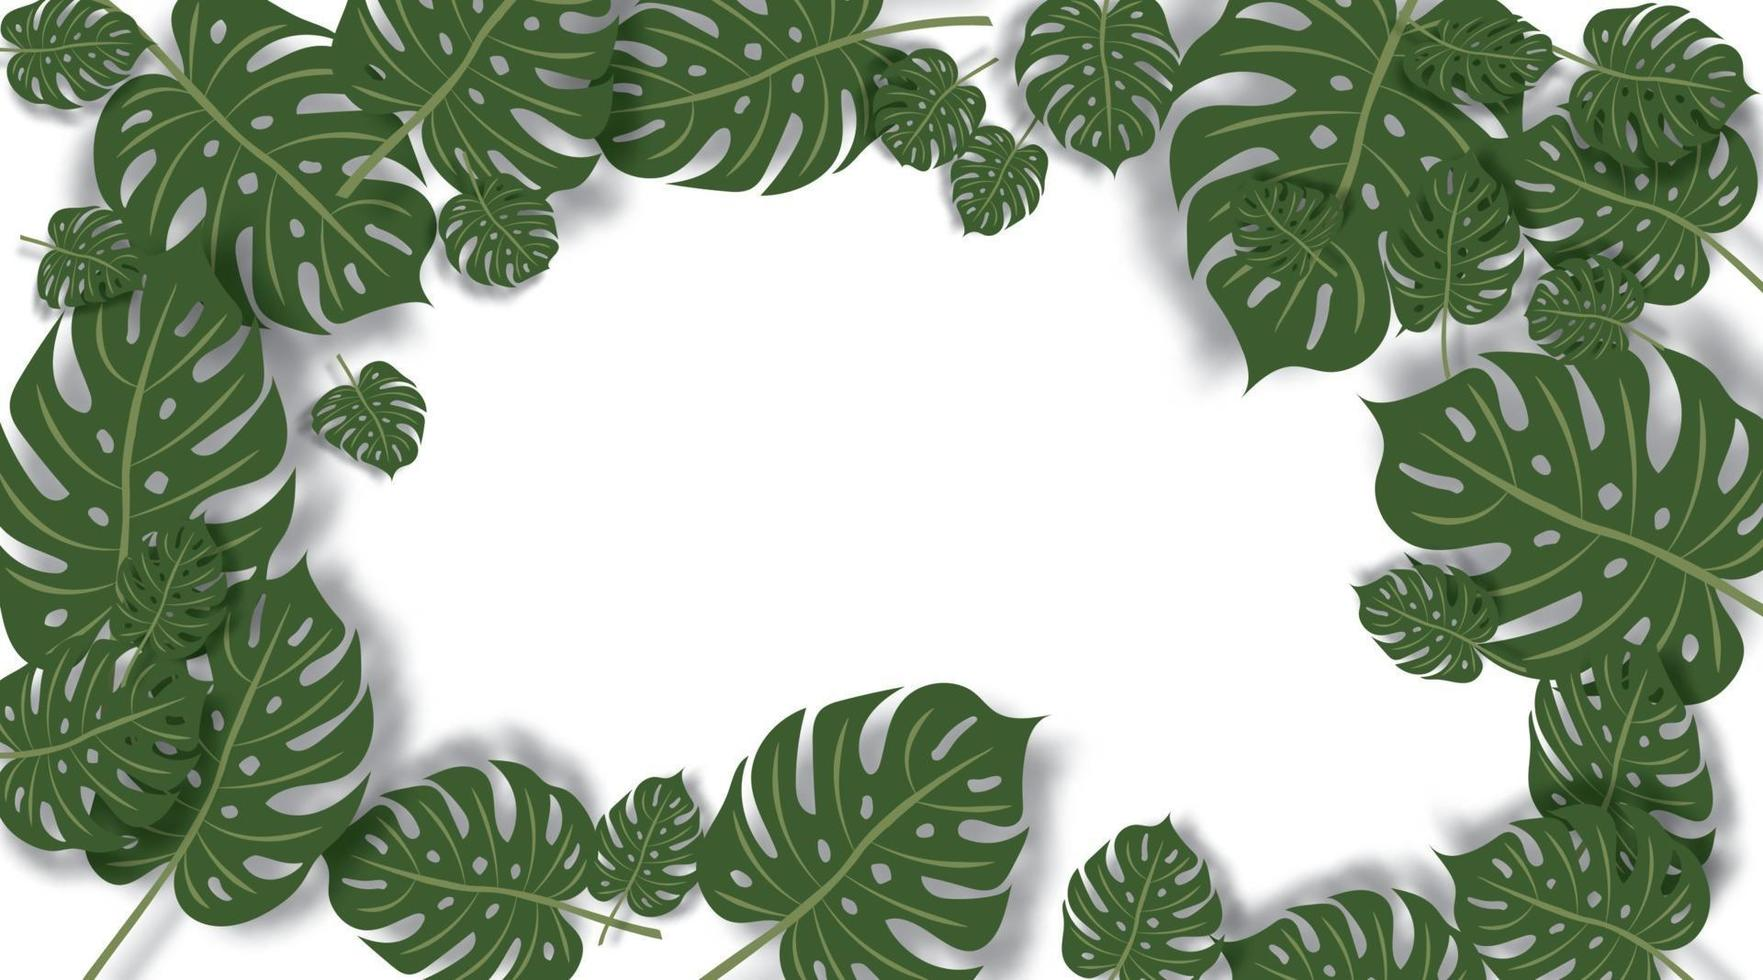 gröna blad vektor bakgrund. gröna blad gränsutrymme för text.